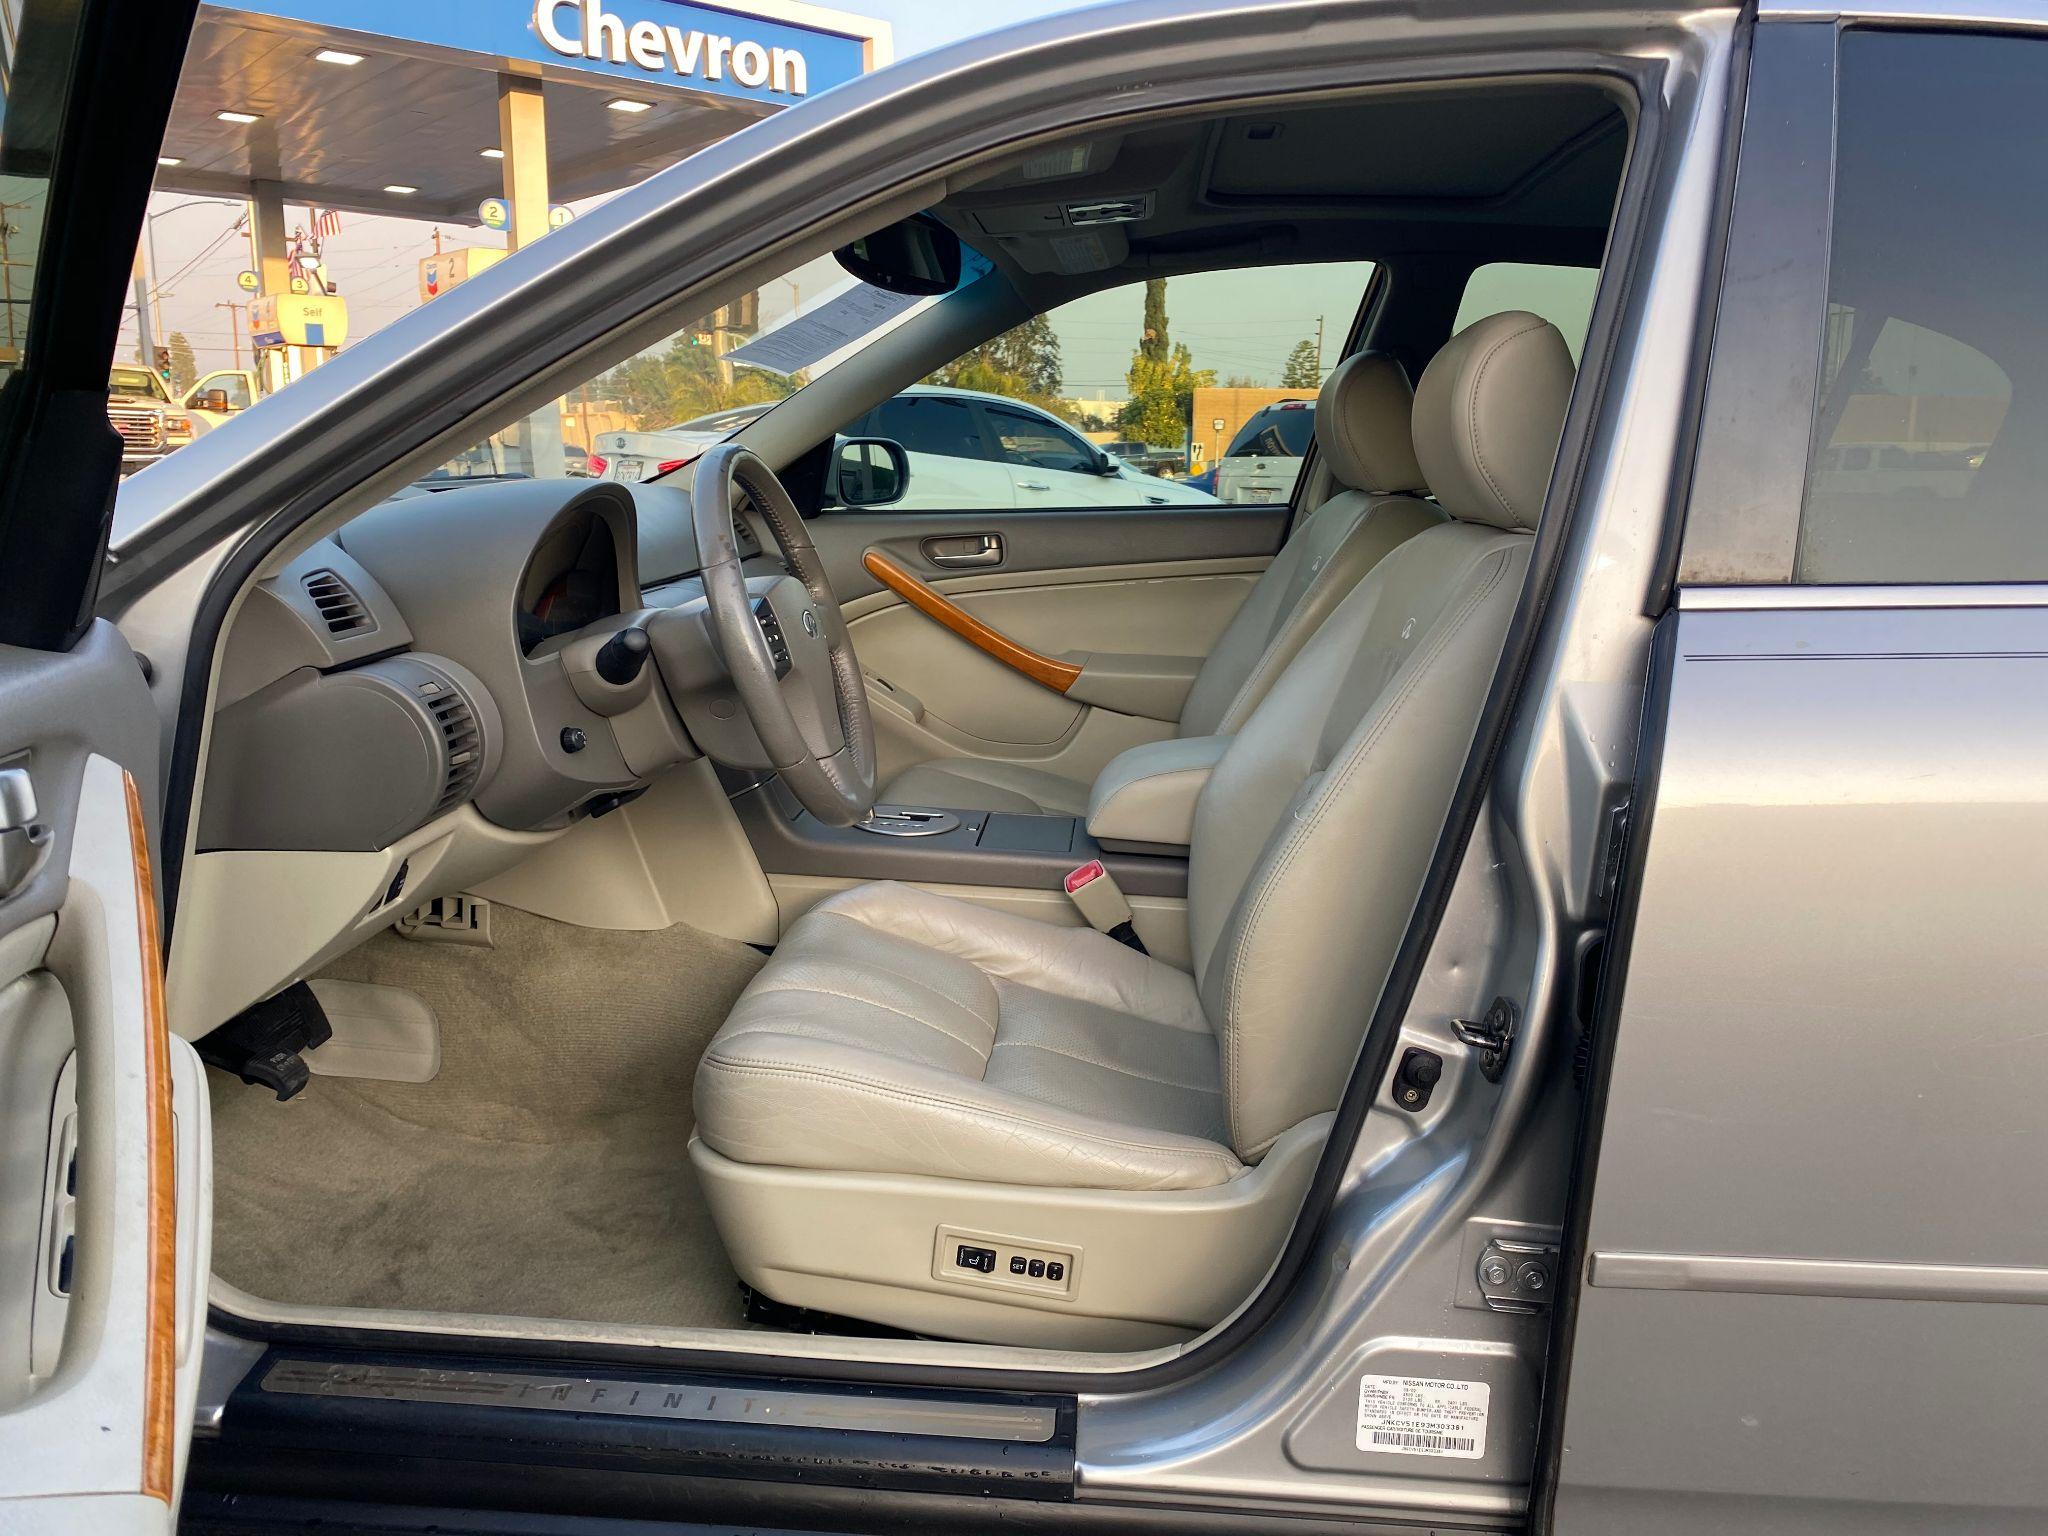 2003 INFINITI G35 w/Leather